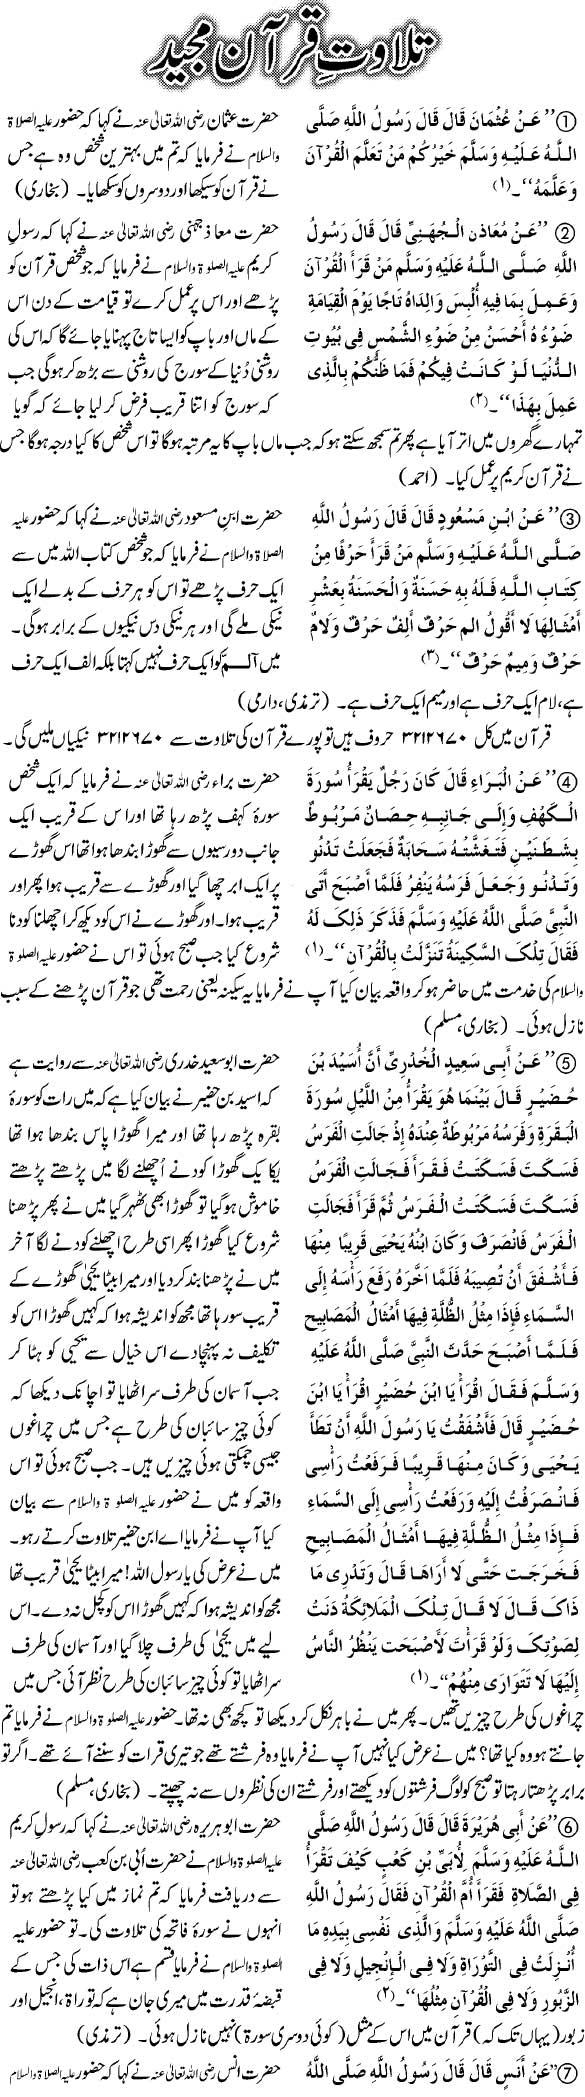 Tilawat Quran Pak